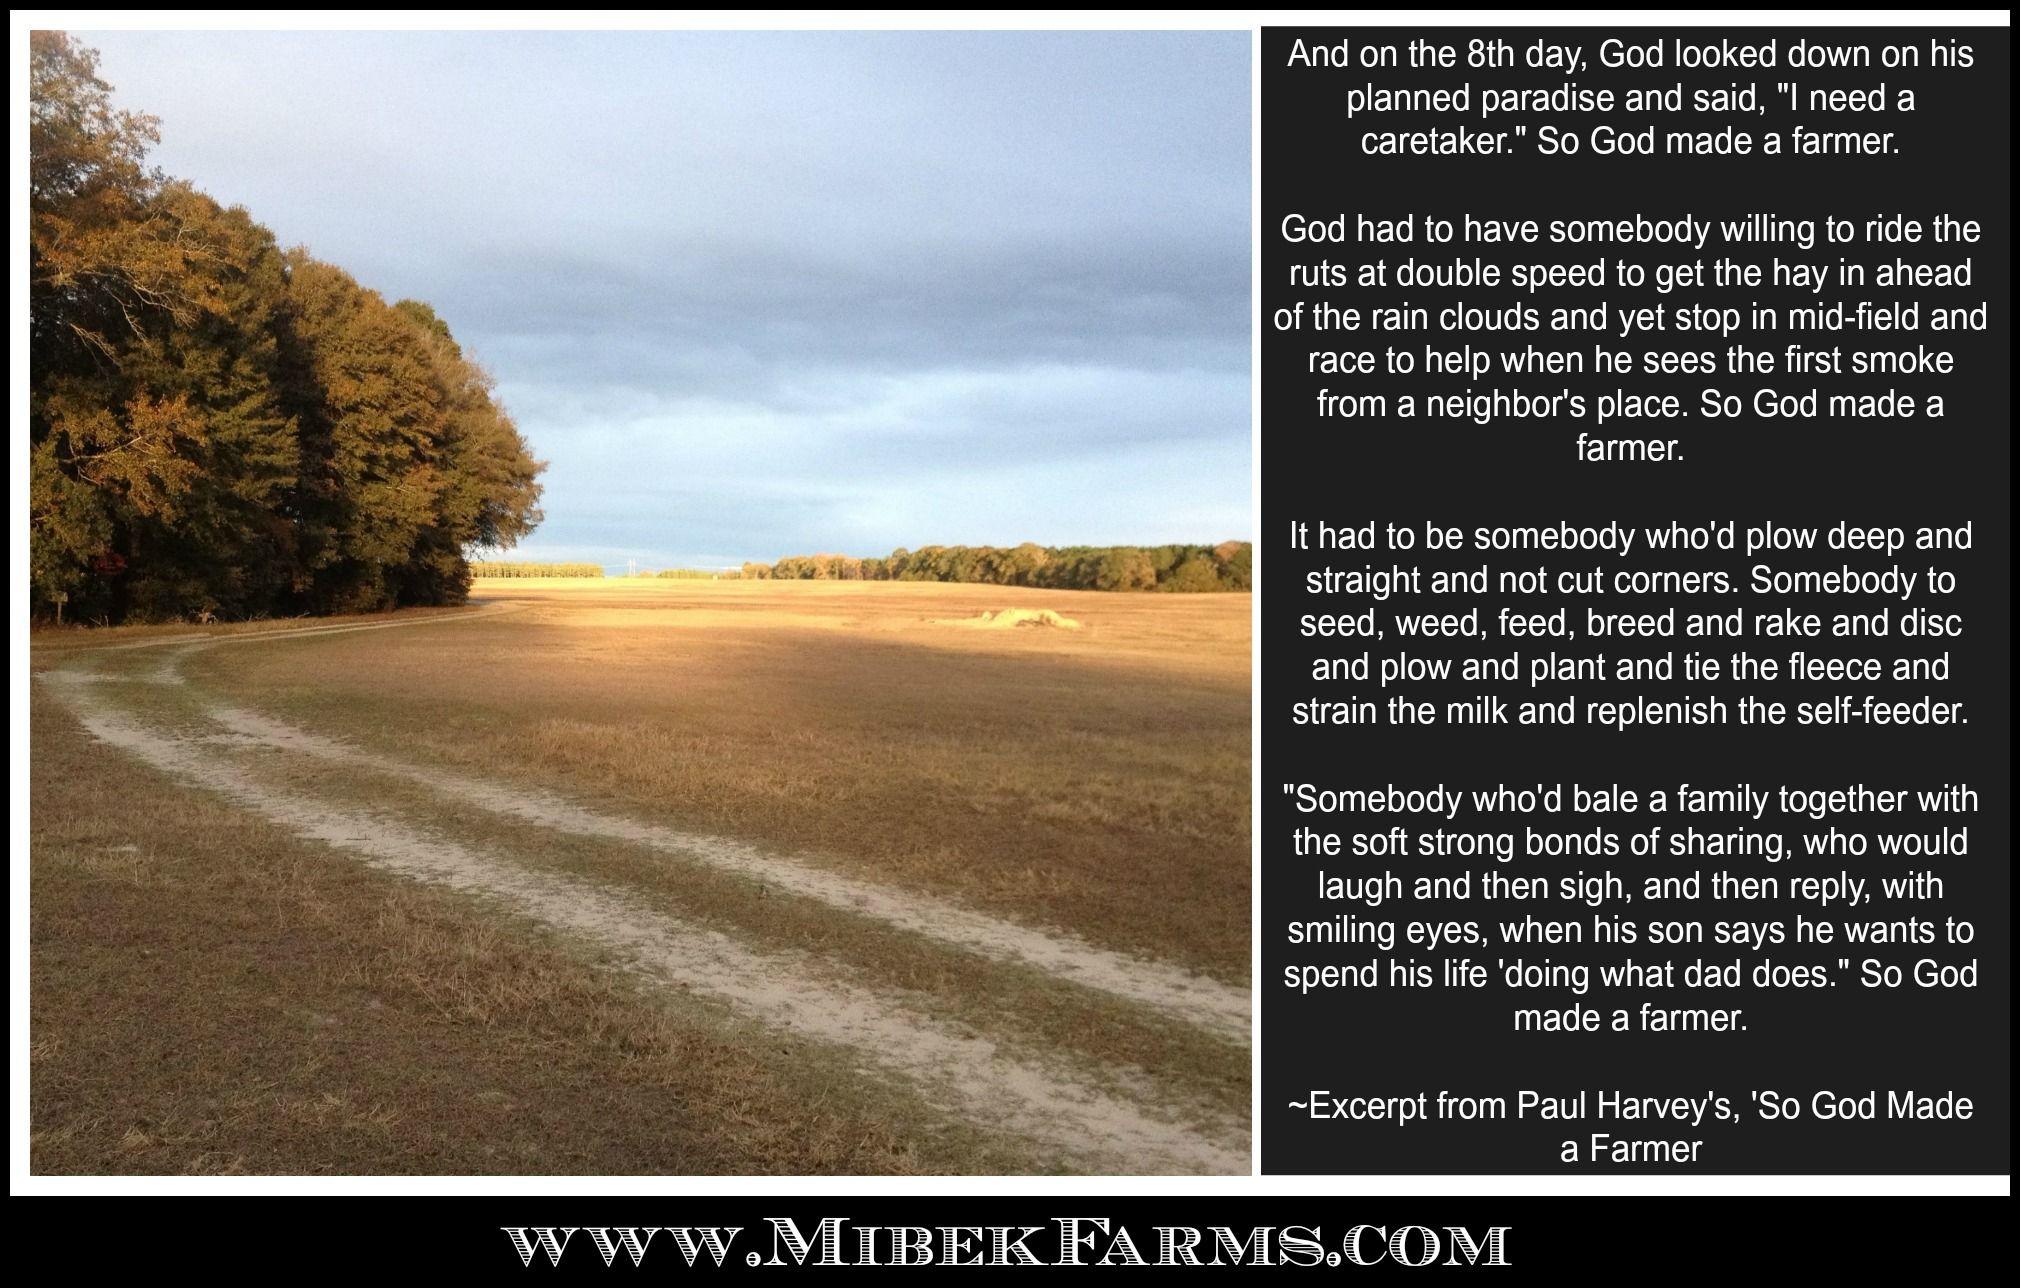 Paul harveys essay on dirt roads creative essay ghostwriting services gb